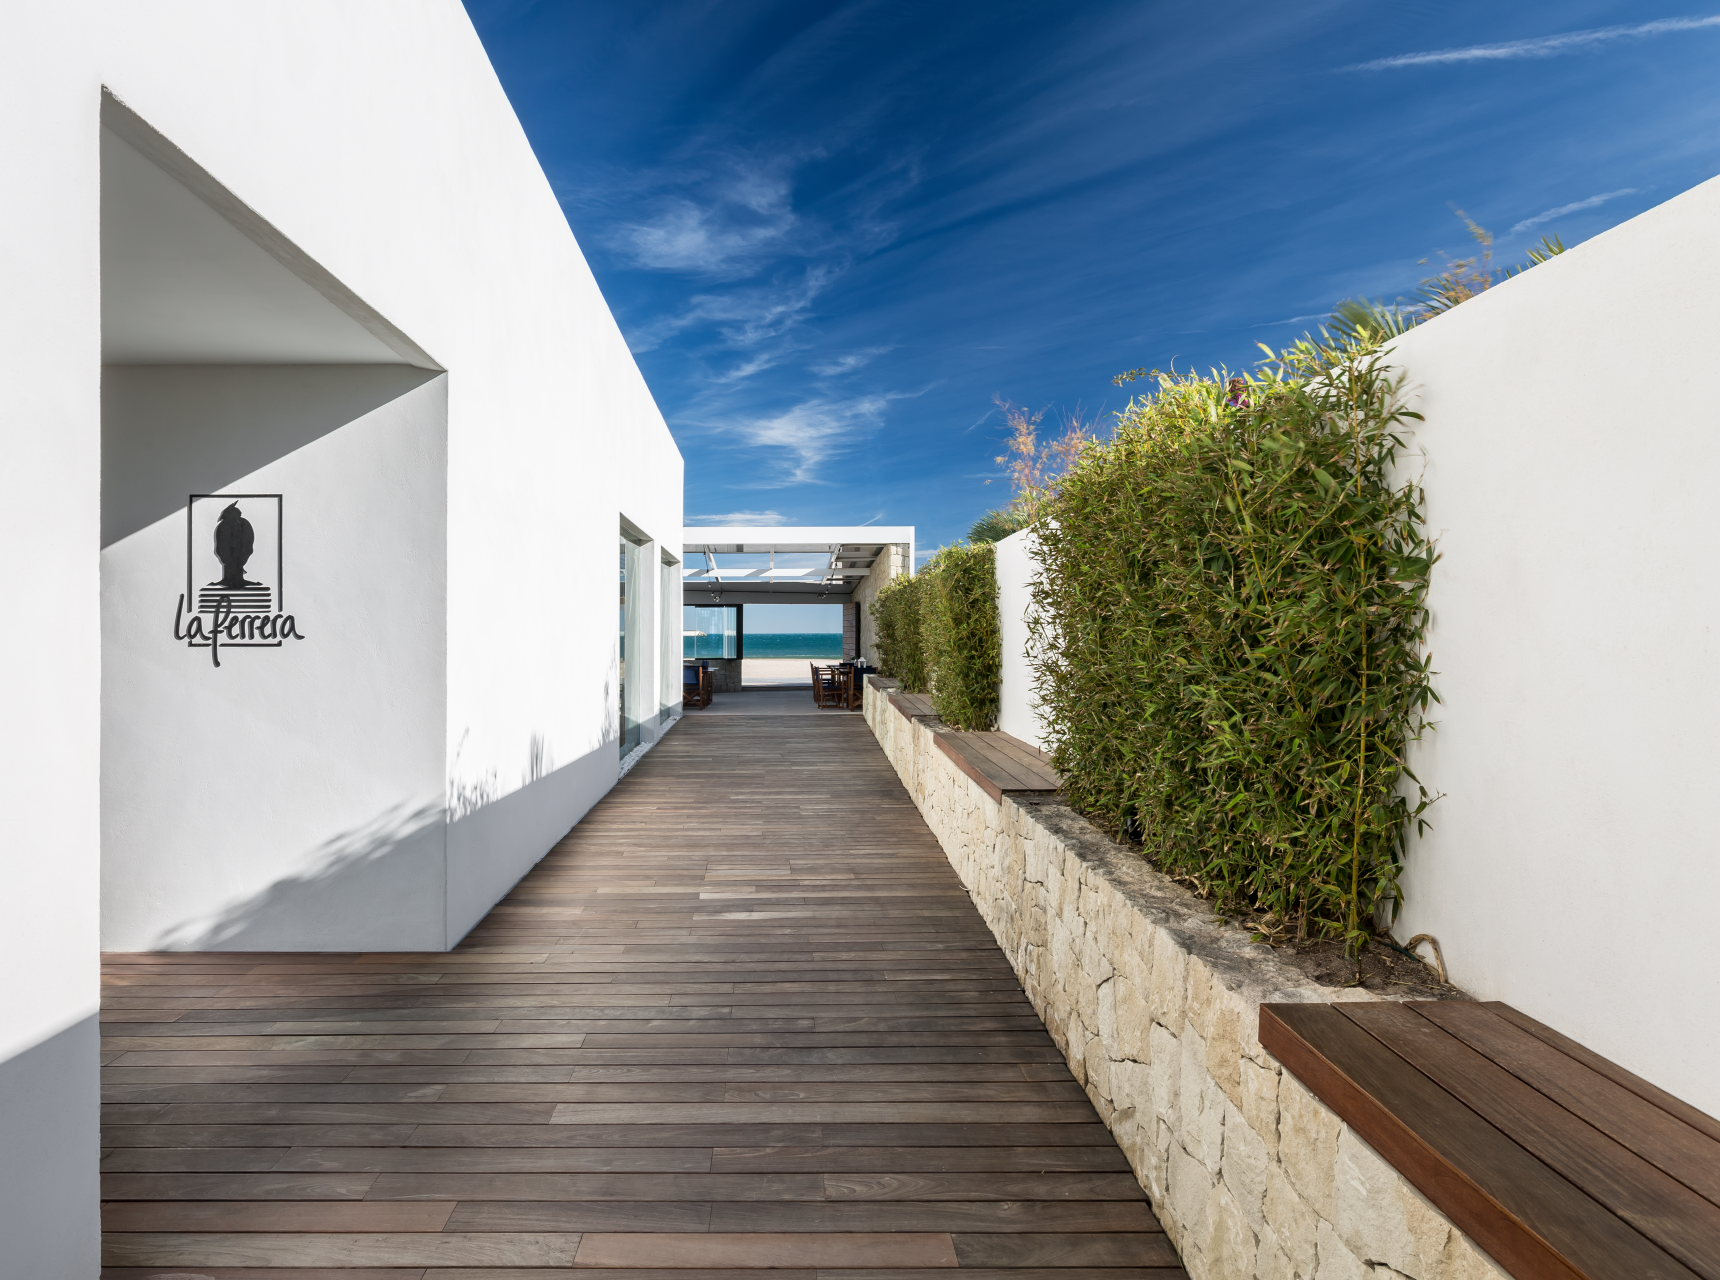 fotografia-arquitectura-valencia-german-cabo-versea-restaurante-ferrera-pinedo (4)